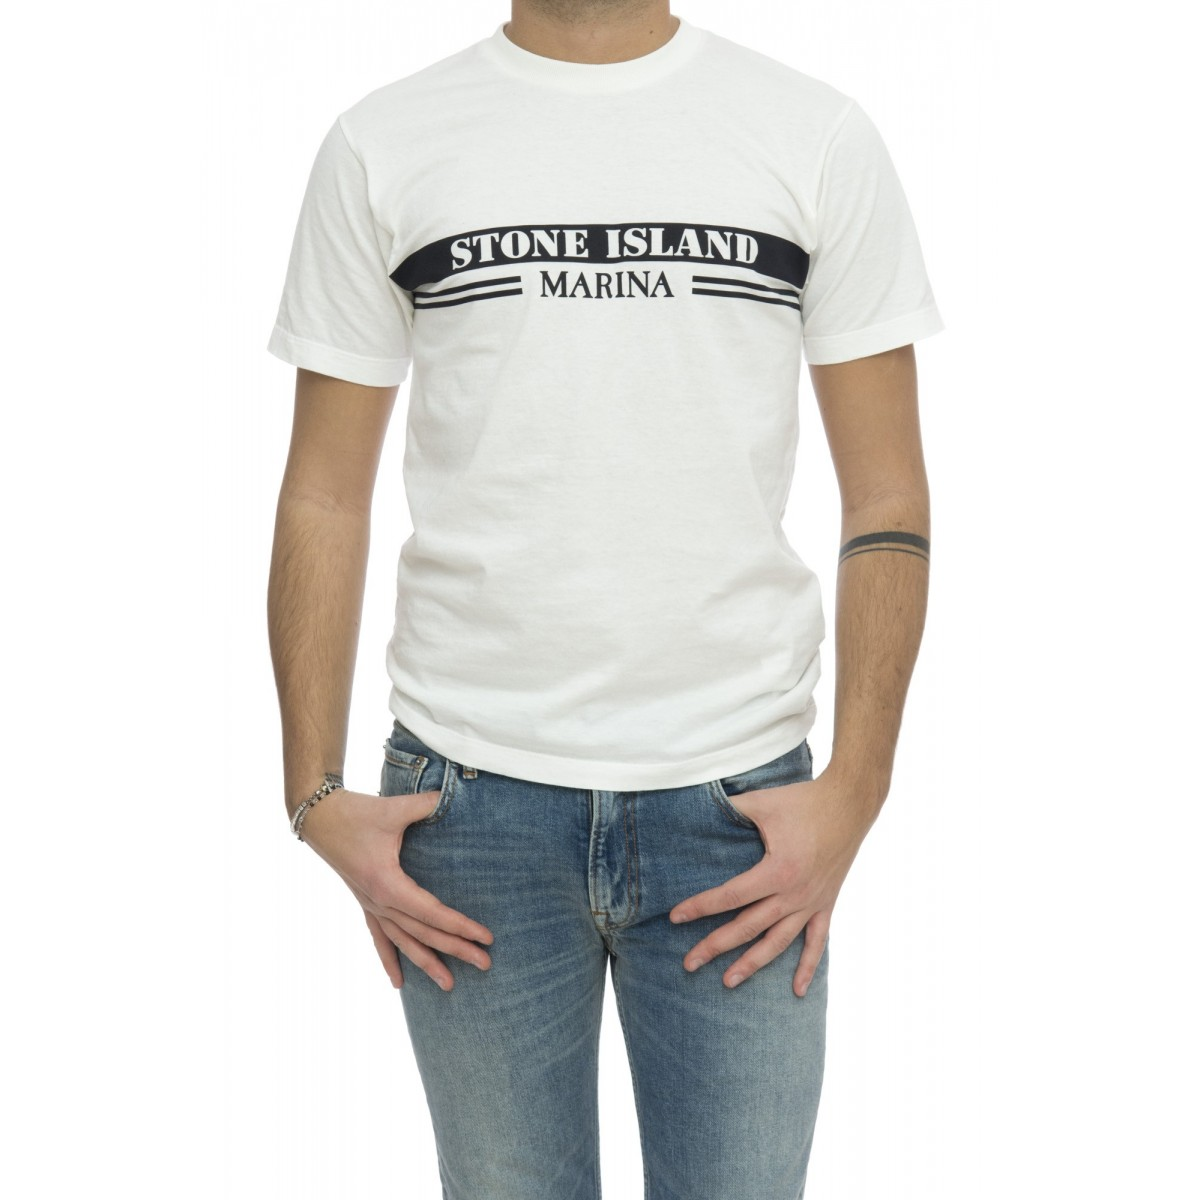 T-shirt - 2nsxe t-shirt marina